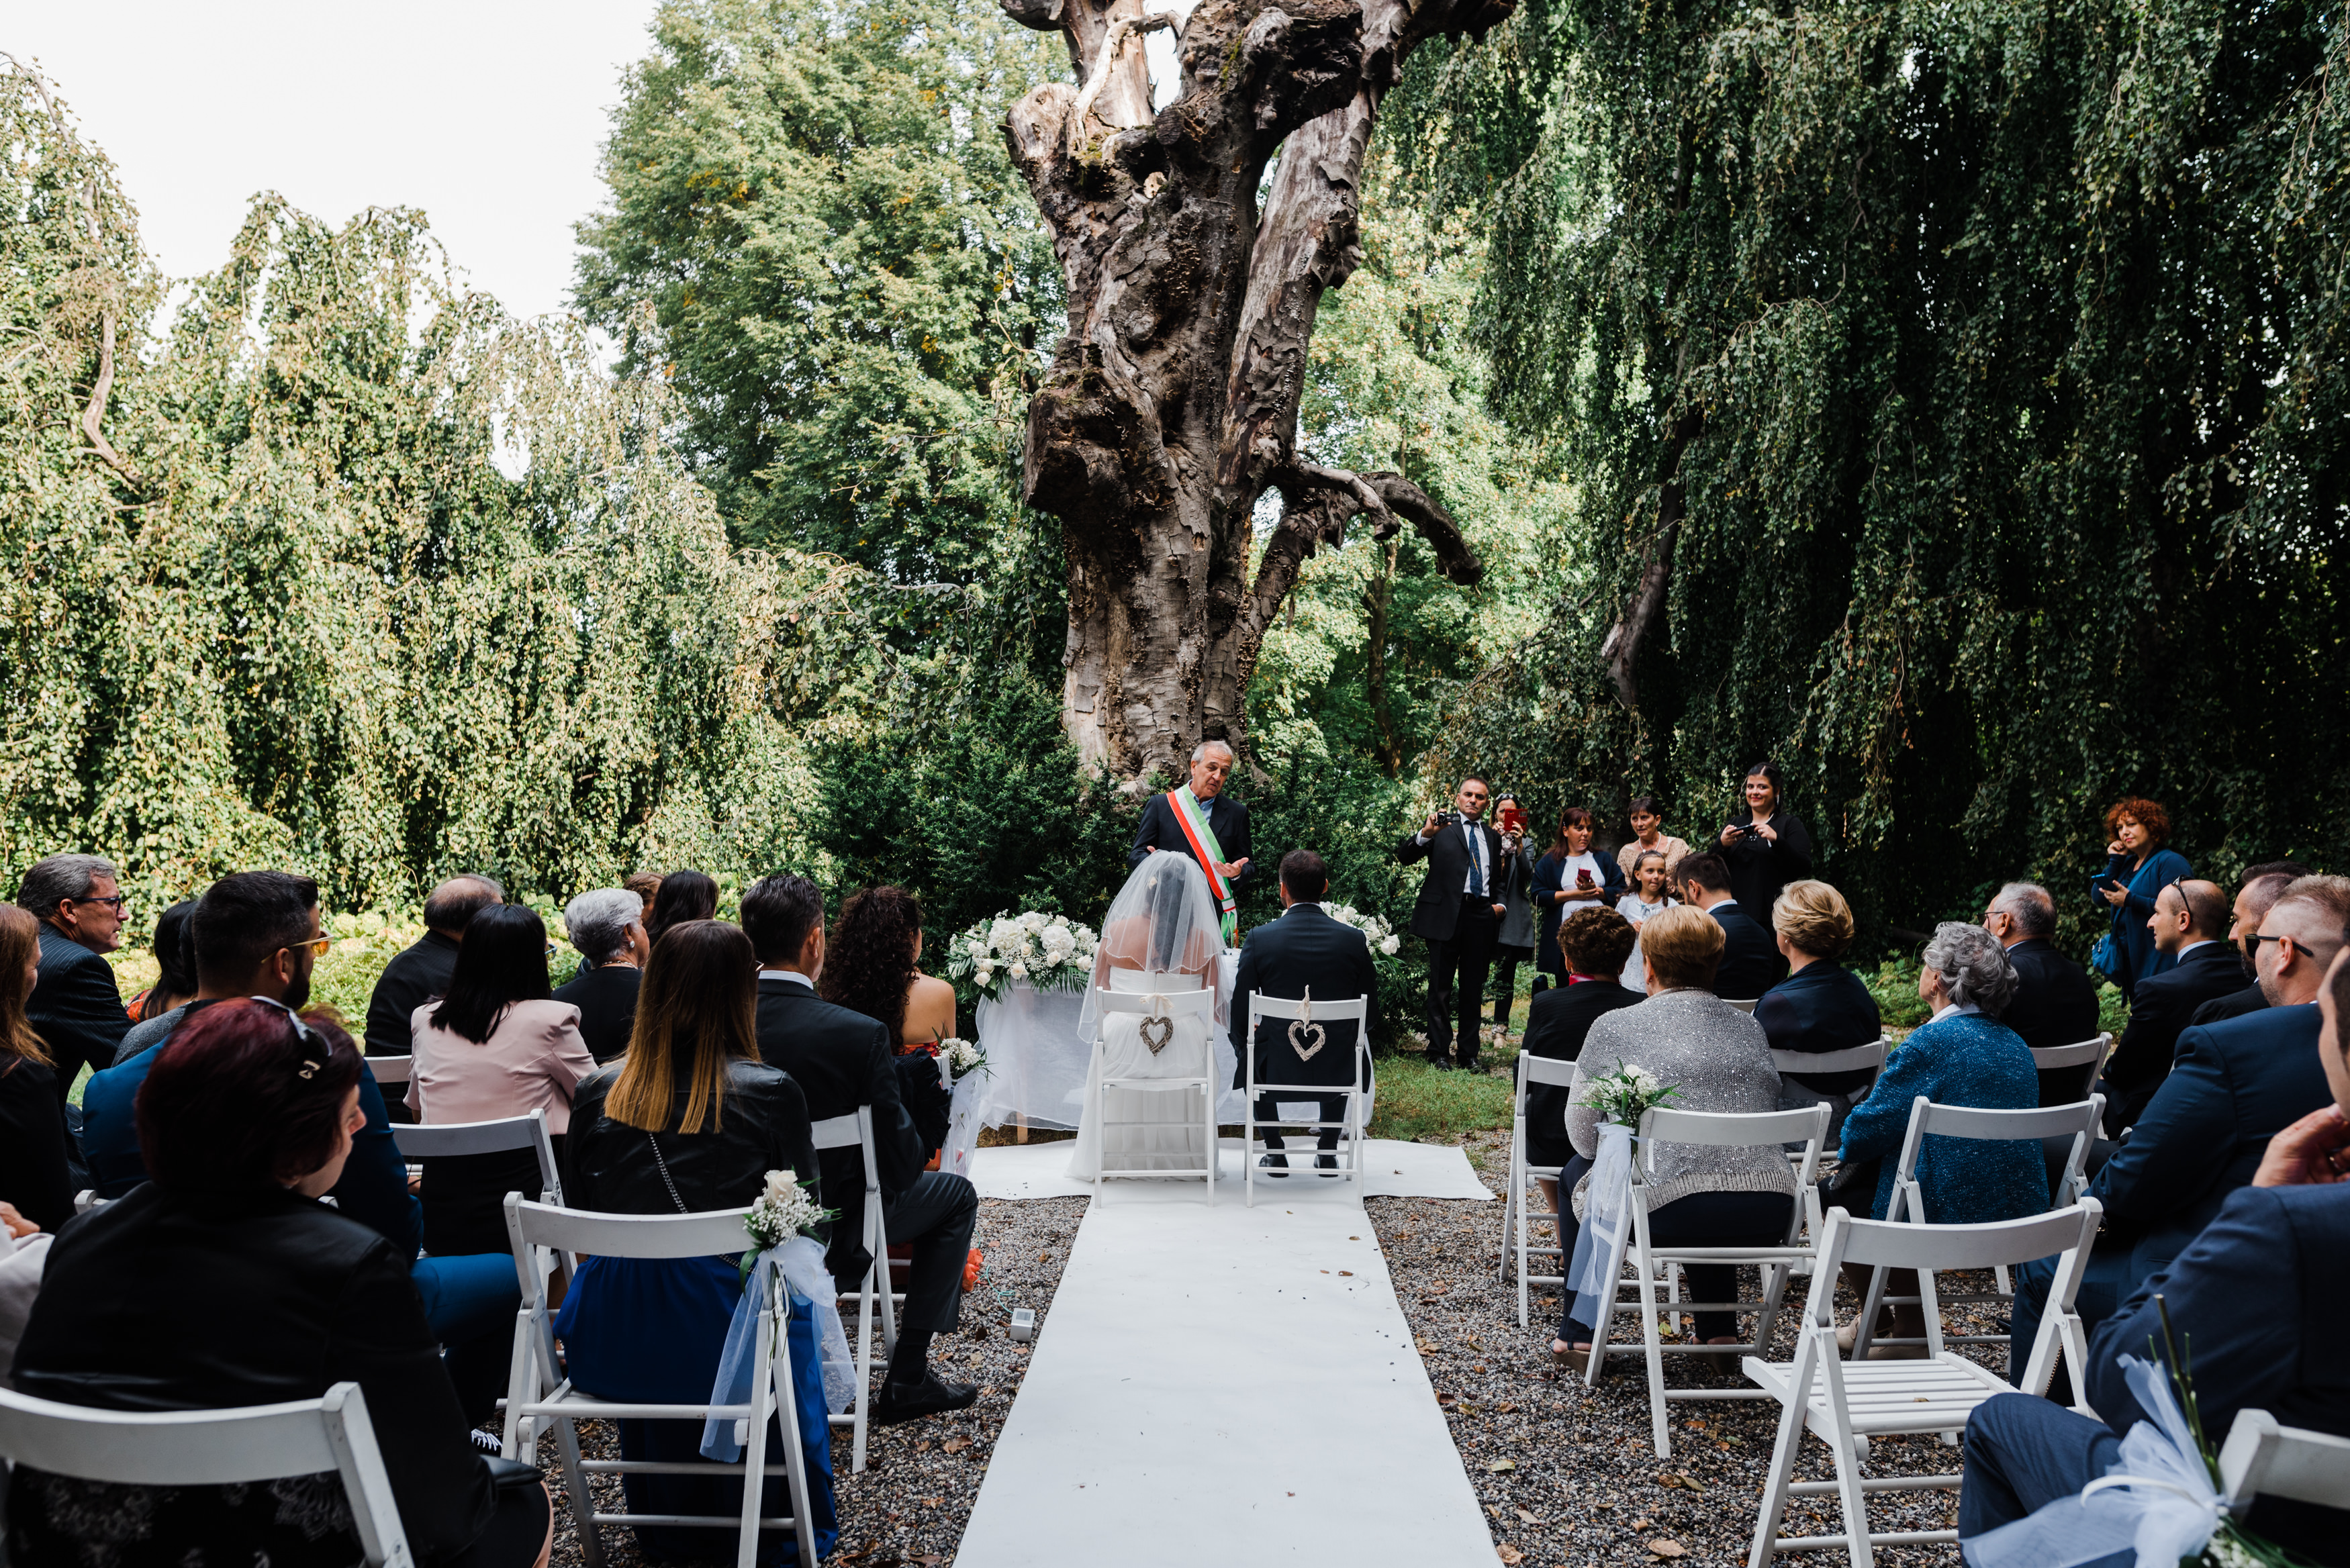 Wedding in Montevecchia, Matrimonio in Montevecchia. Wedding Italo-Mexical, Wedding in Italy with wine and Mariachi